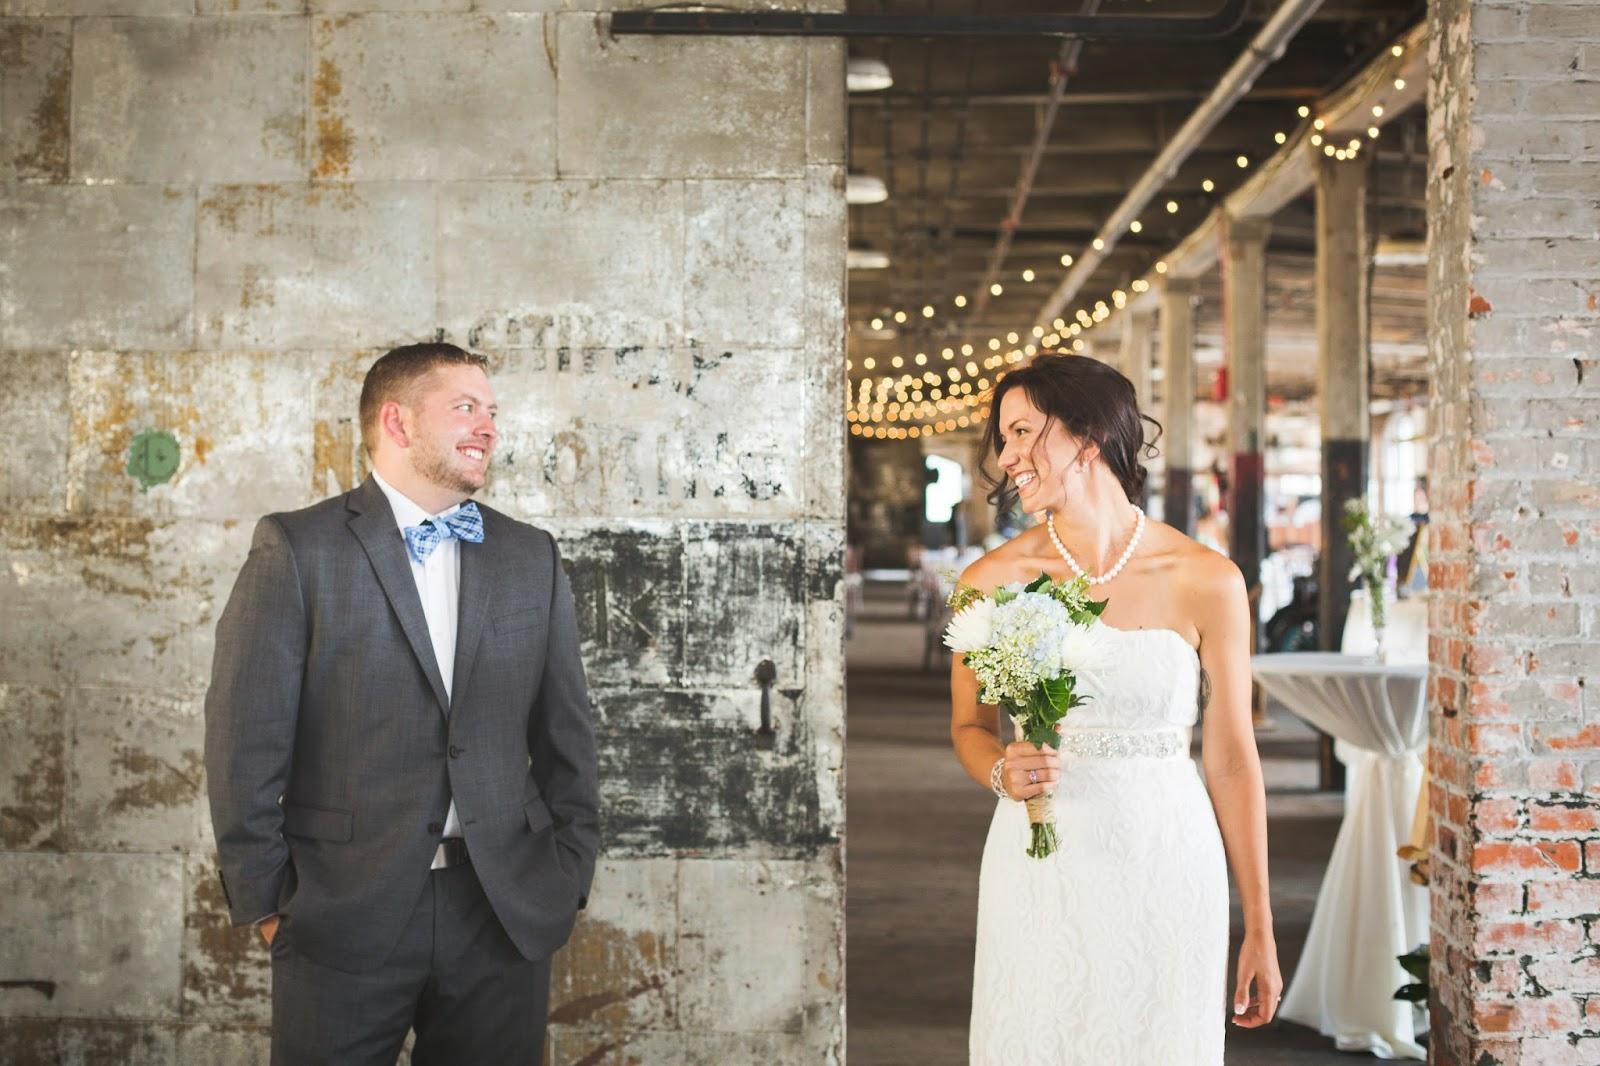 Lana gorman wedding